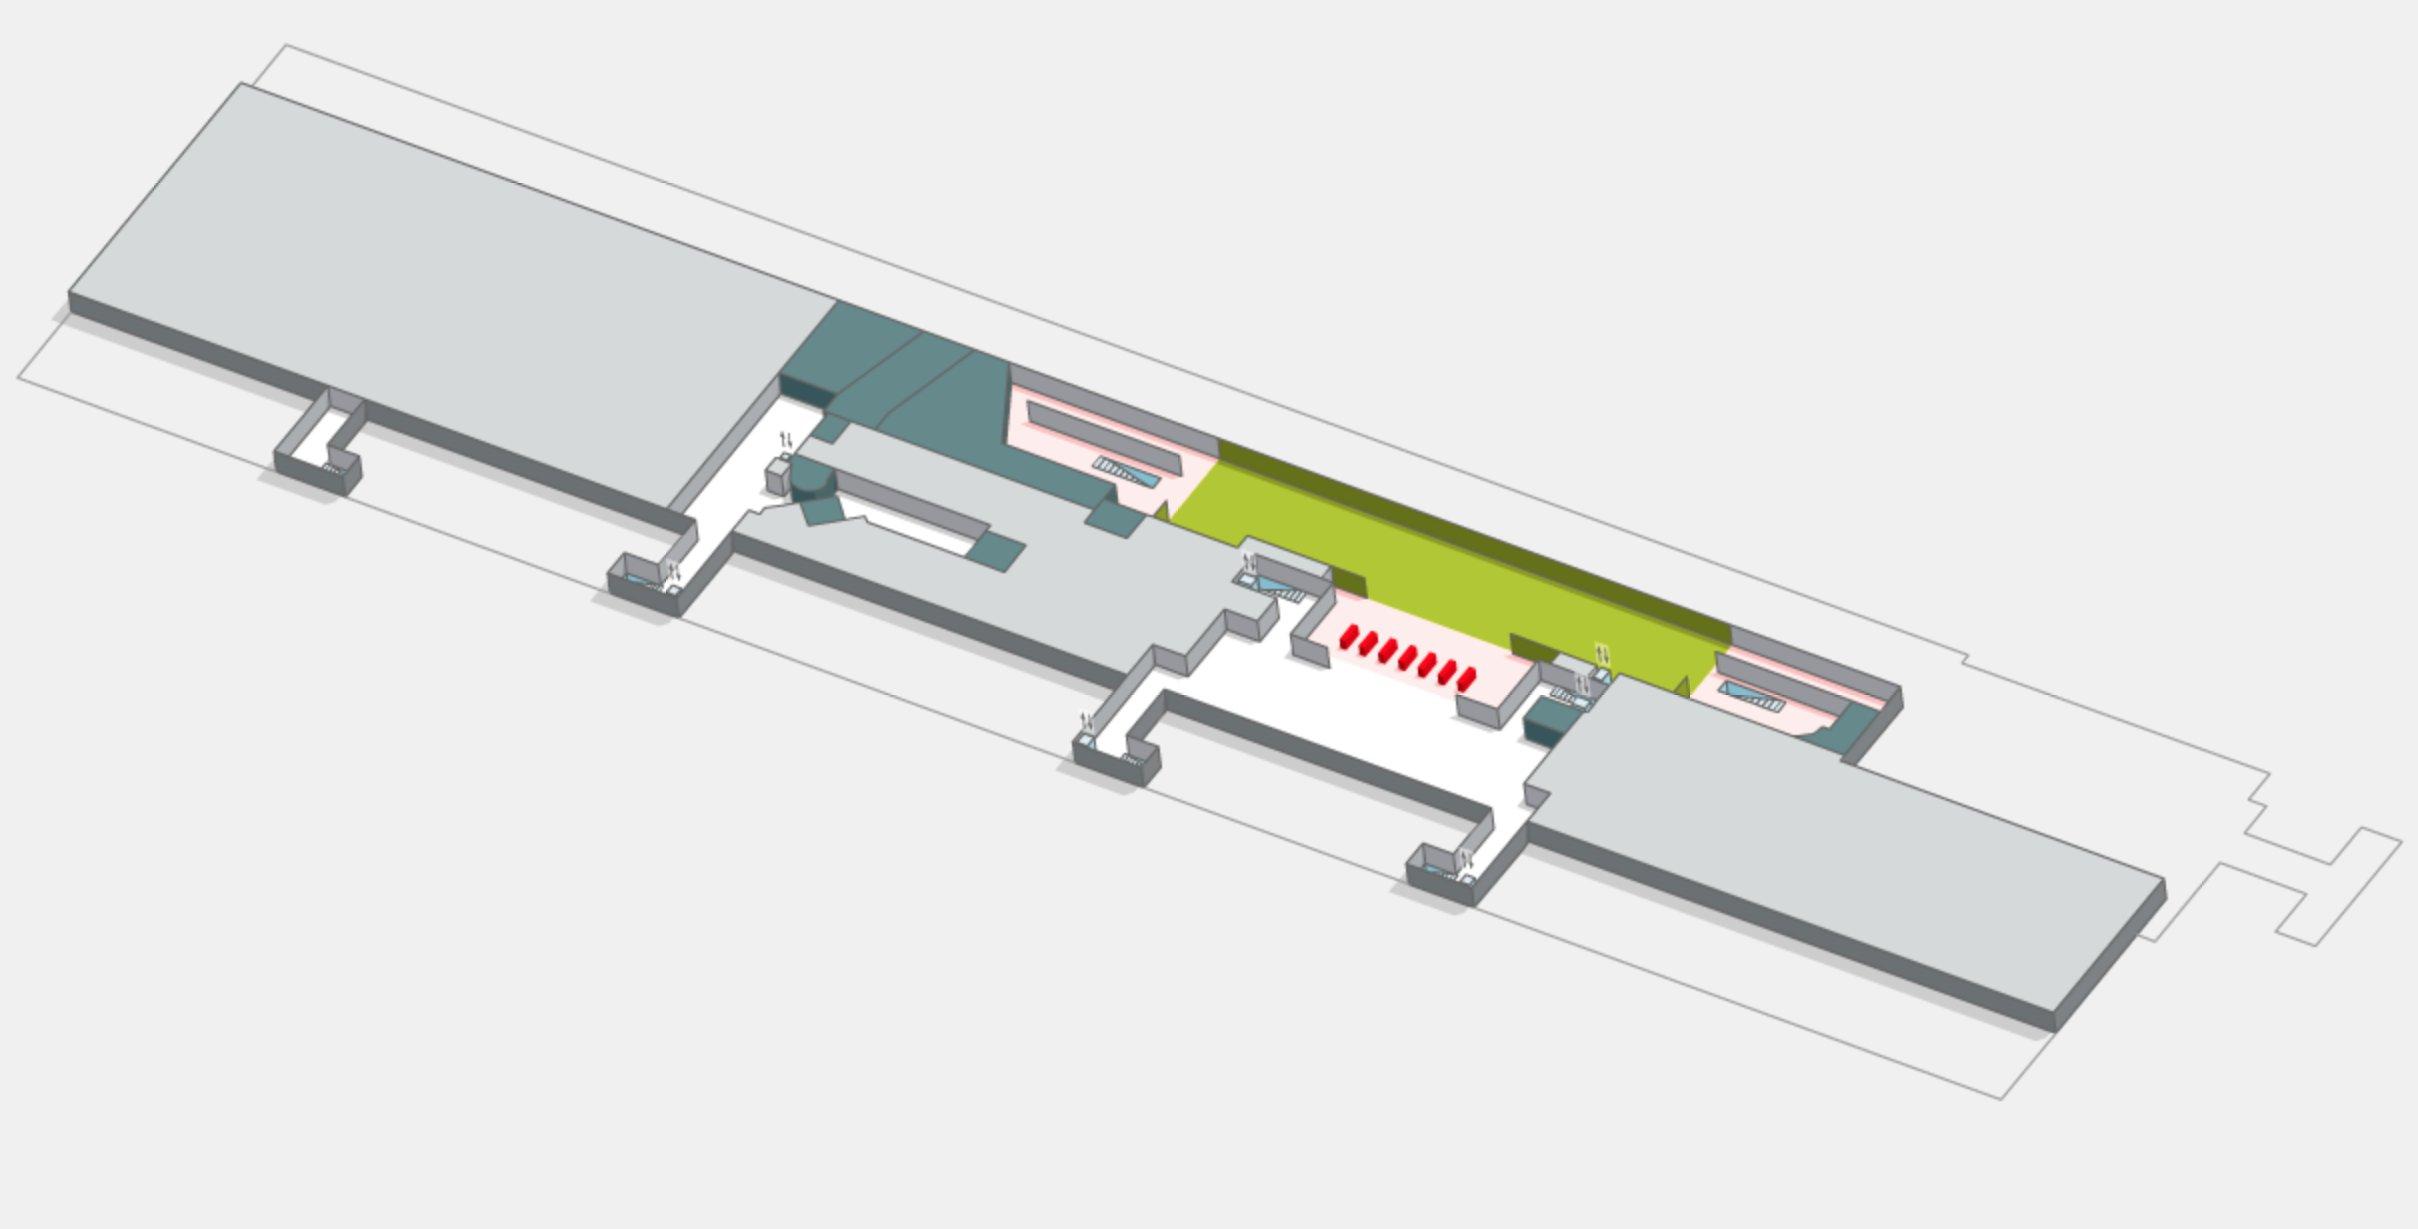 План схема аэропорт Тенерифе Южный Испания - Терминал 1